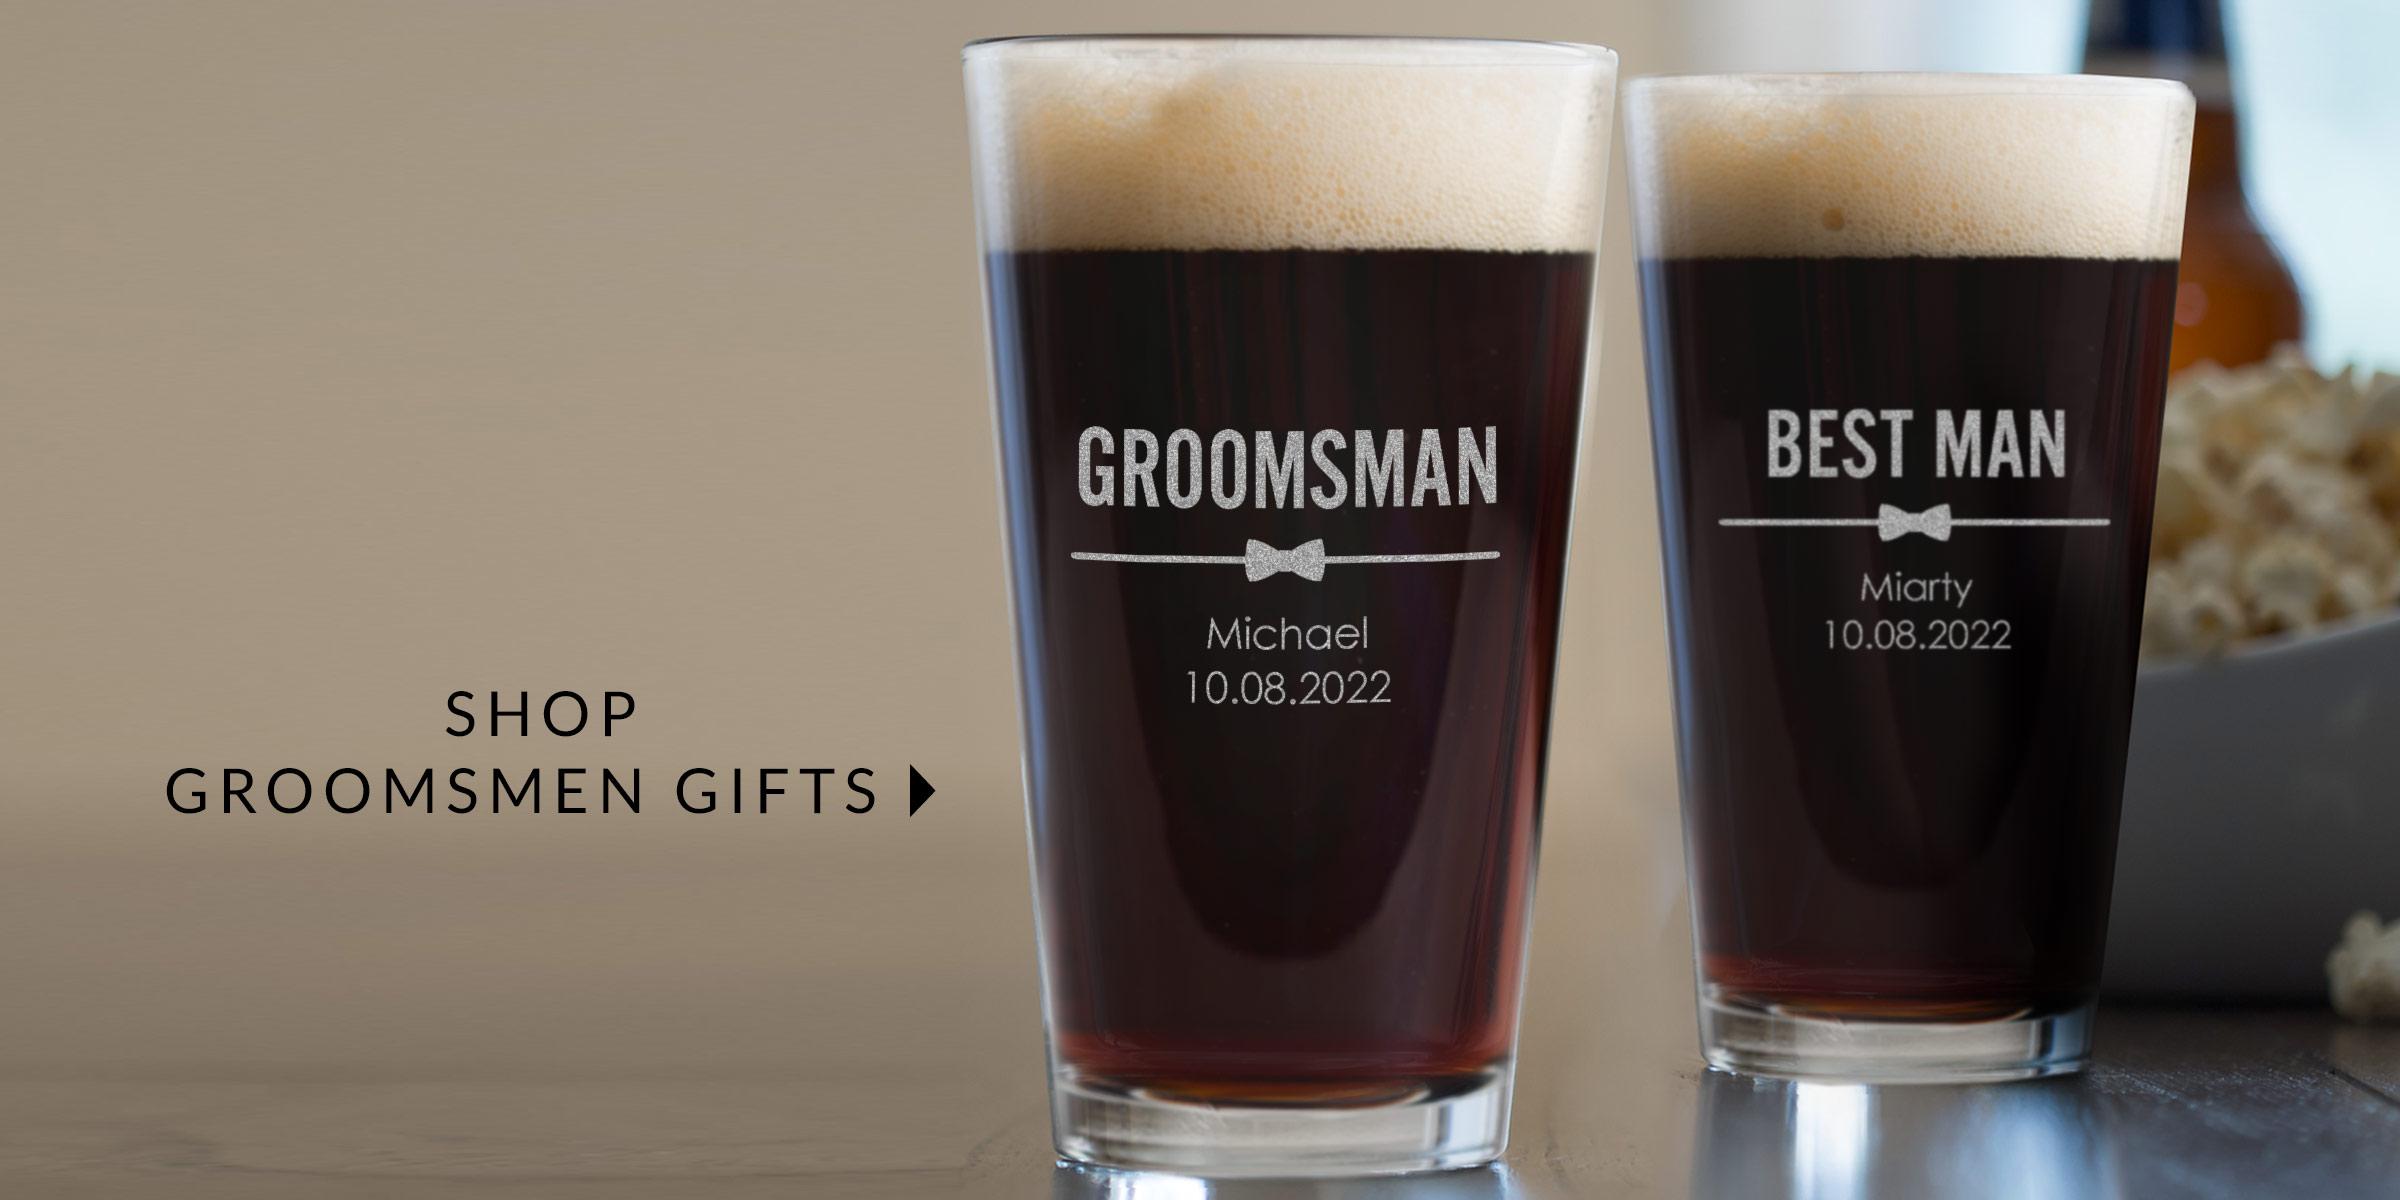 Shop Groomsmen Gifts